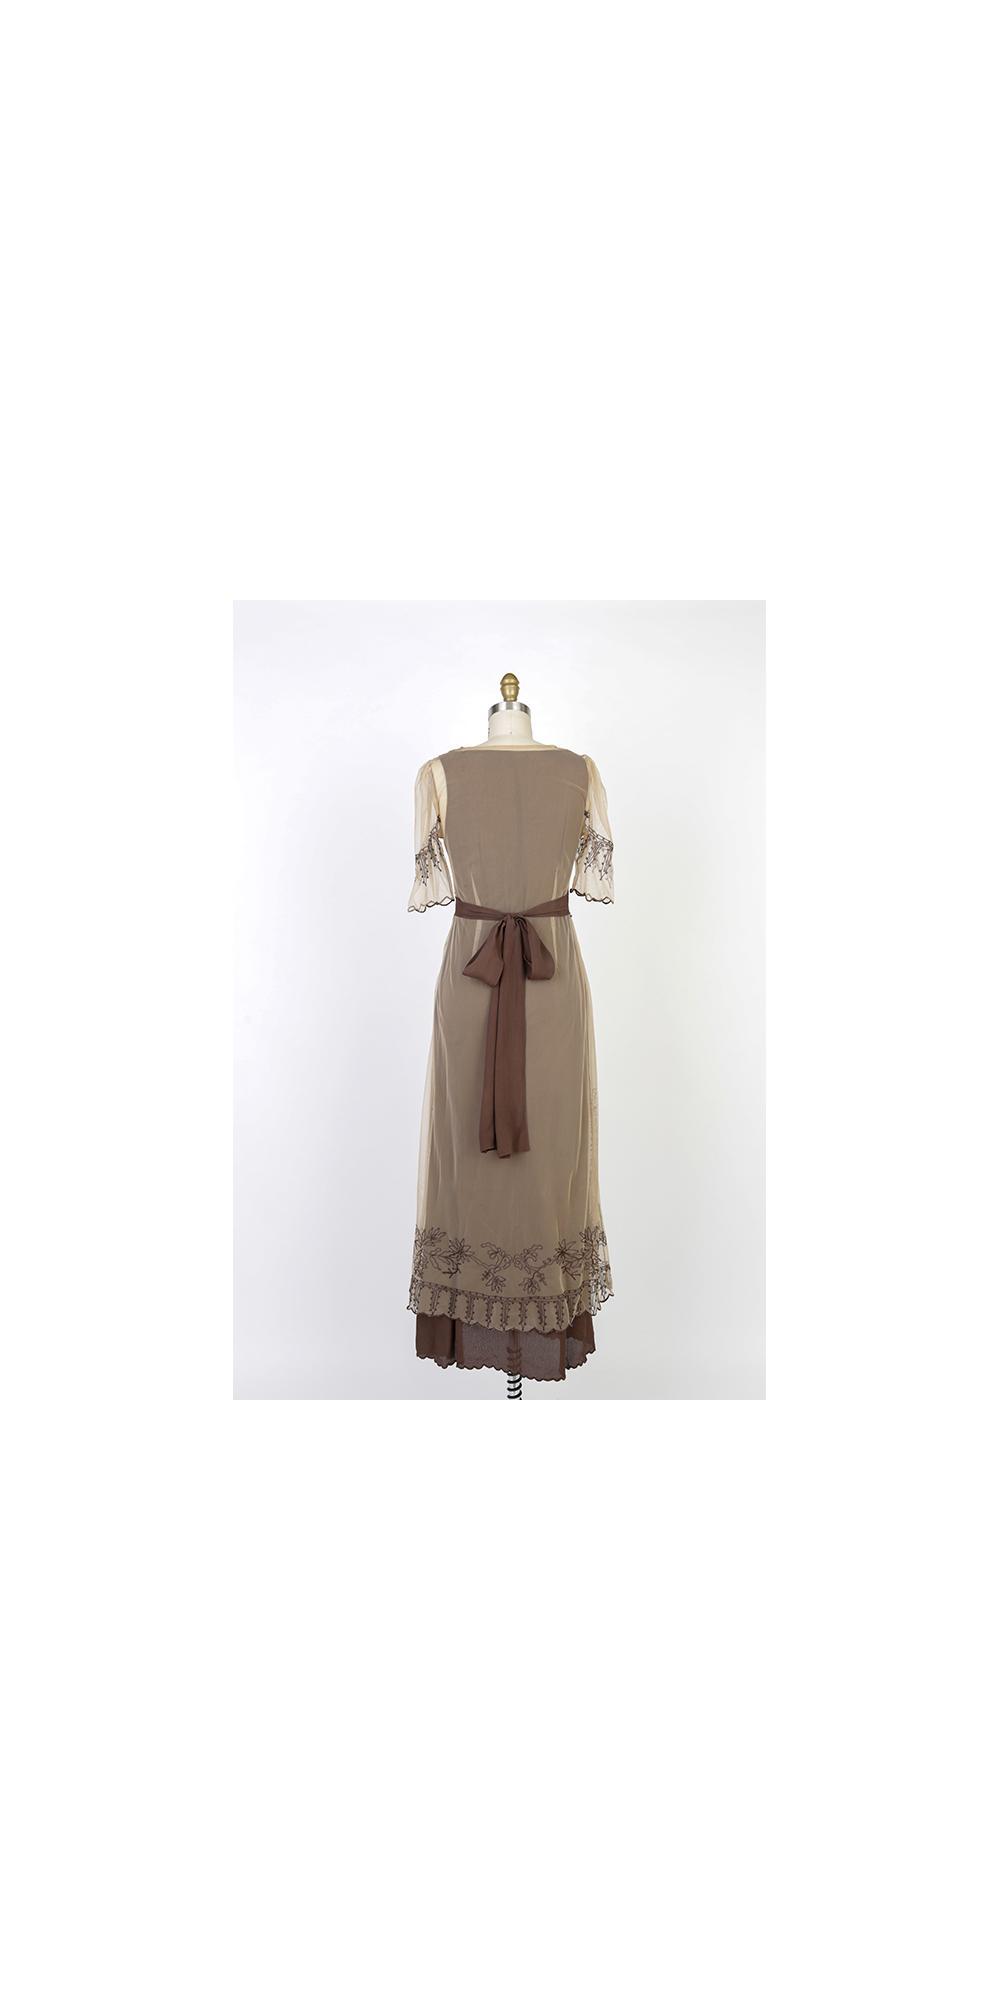 nataya 40007 new titanic dress in milk coffee. Black Bedroom Furniture Sets. Home Design Ideas